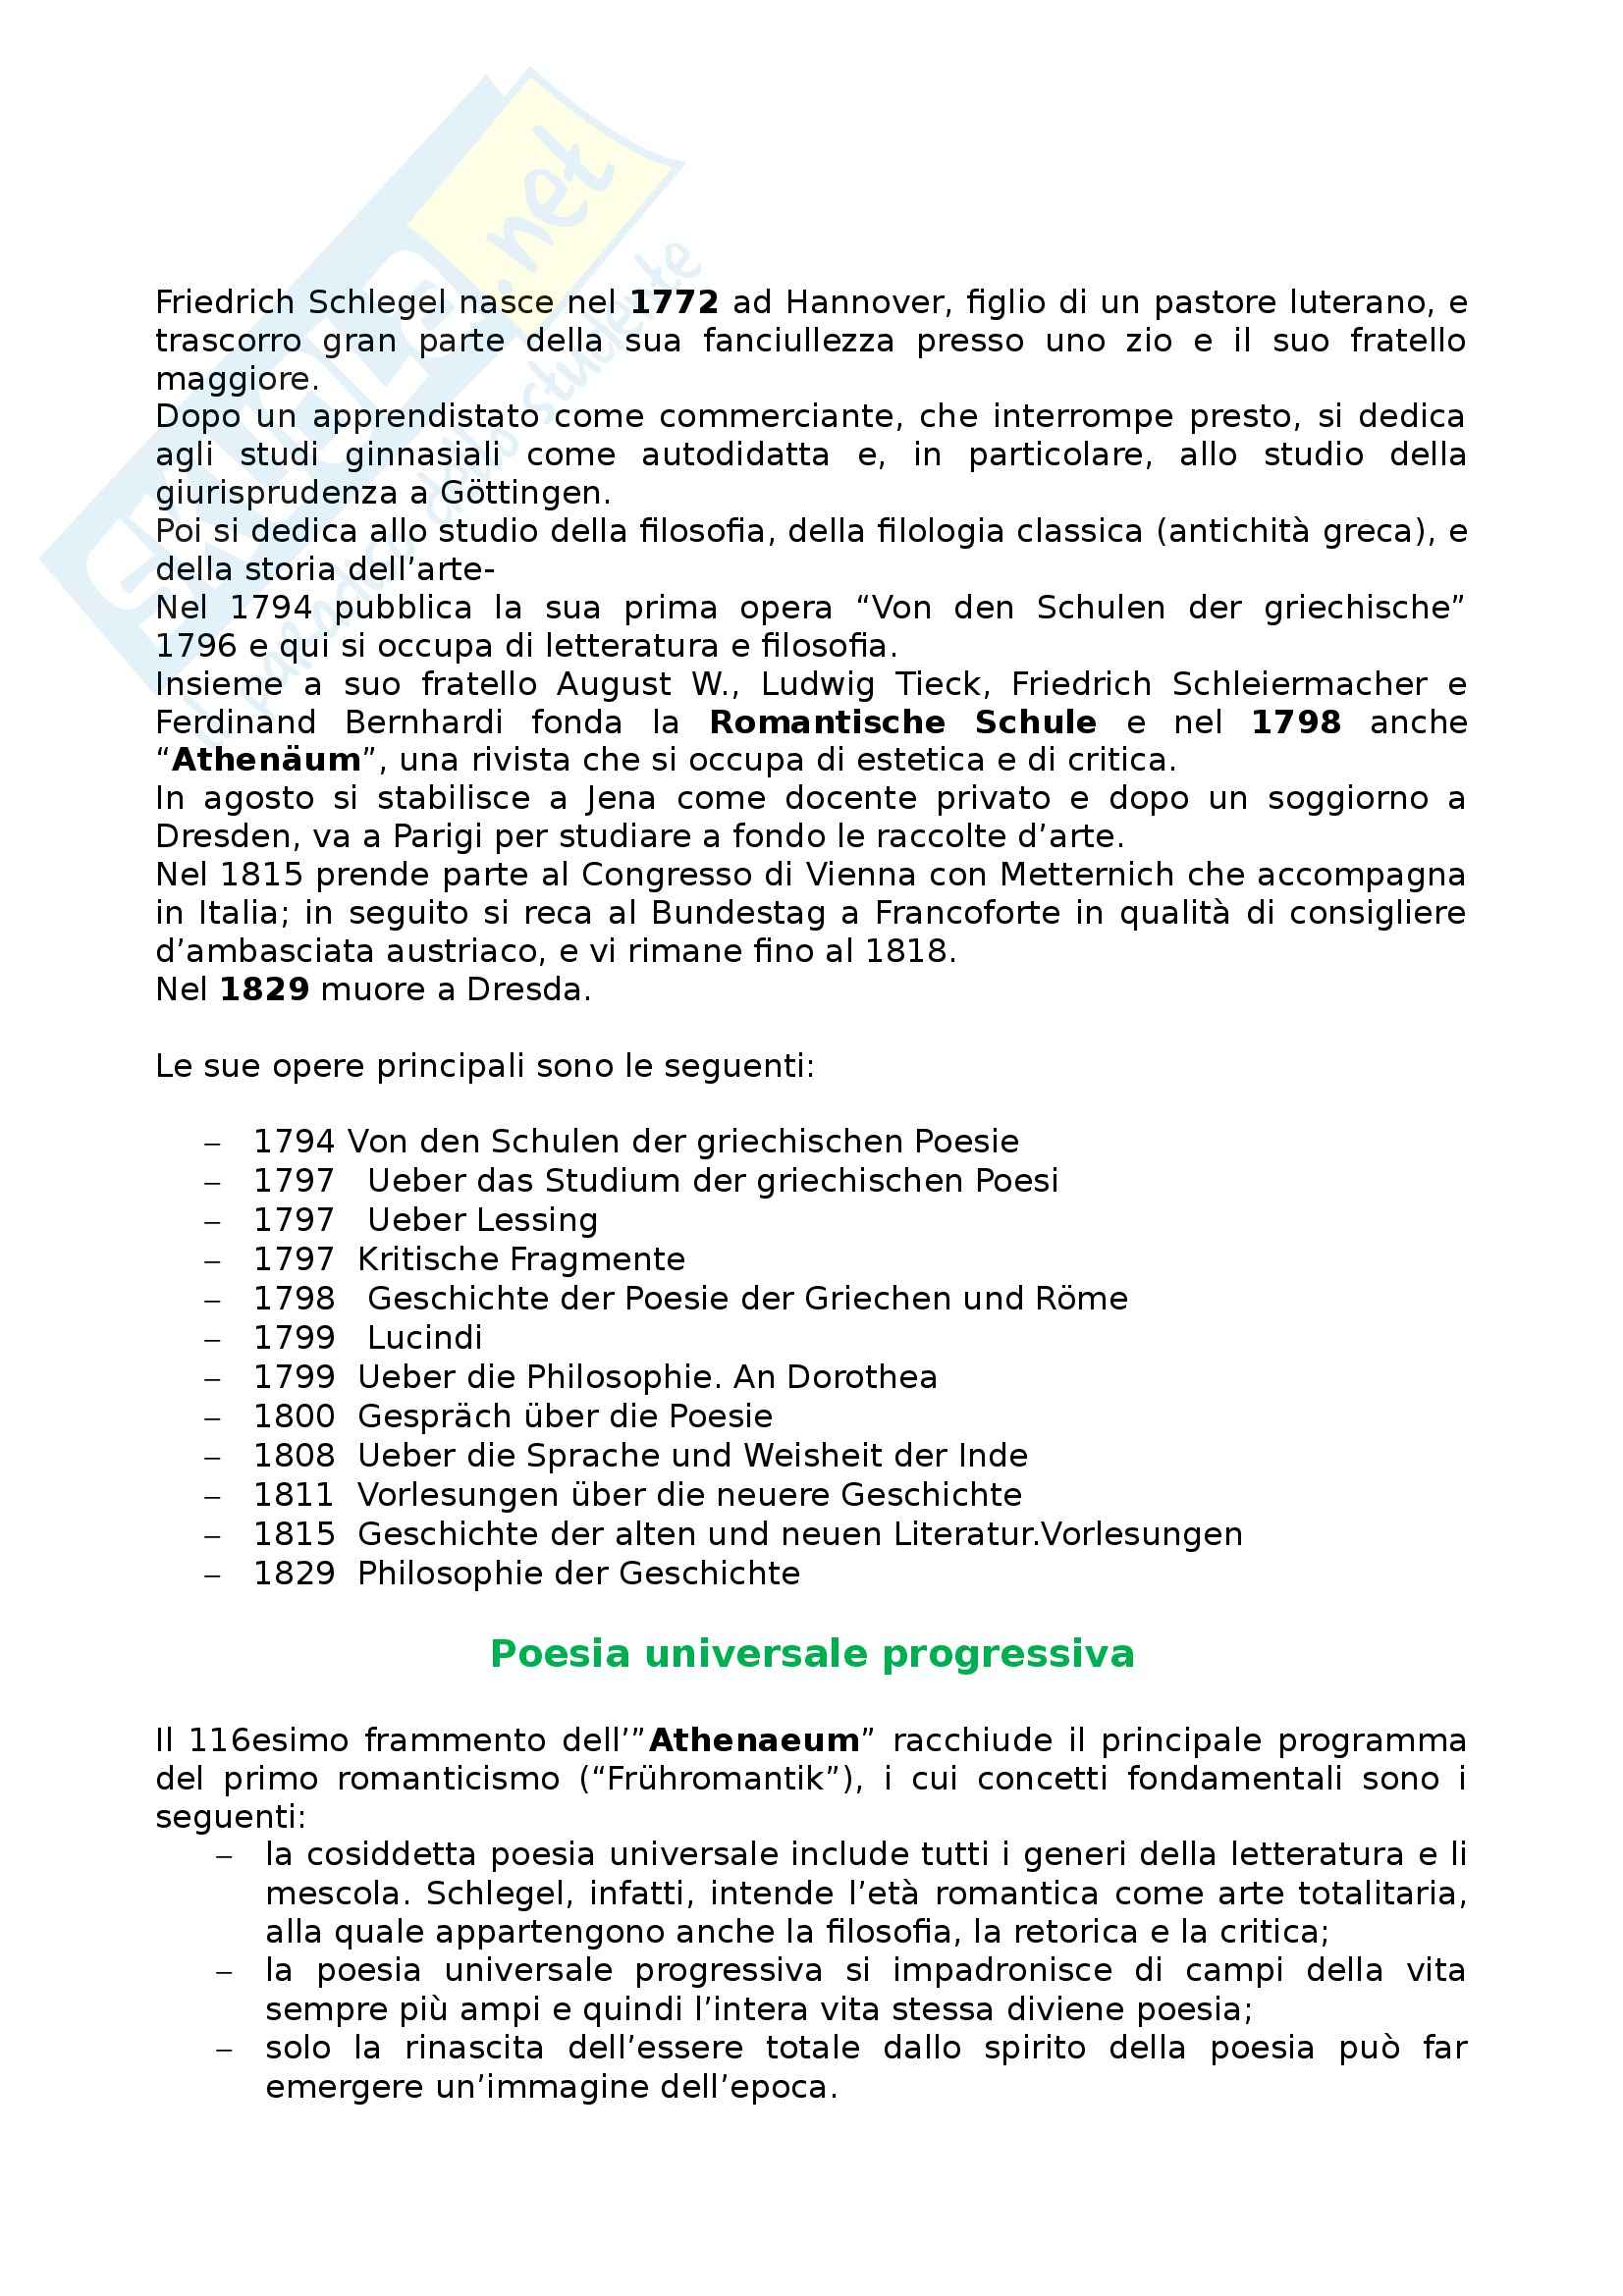 Riassunto esame Letteratura tedesca, prof. Frola, libro consigliato Die Deutsche Literatur in Text und Darstellung - Romantik 1